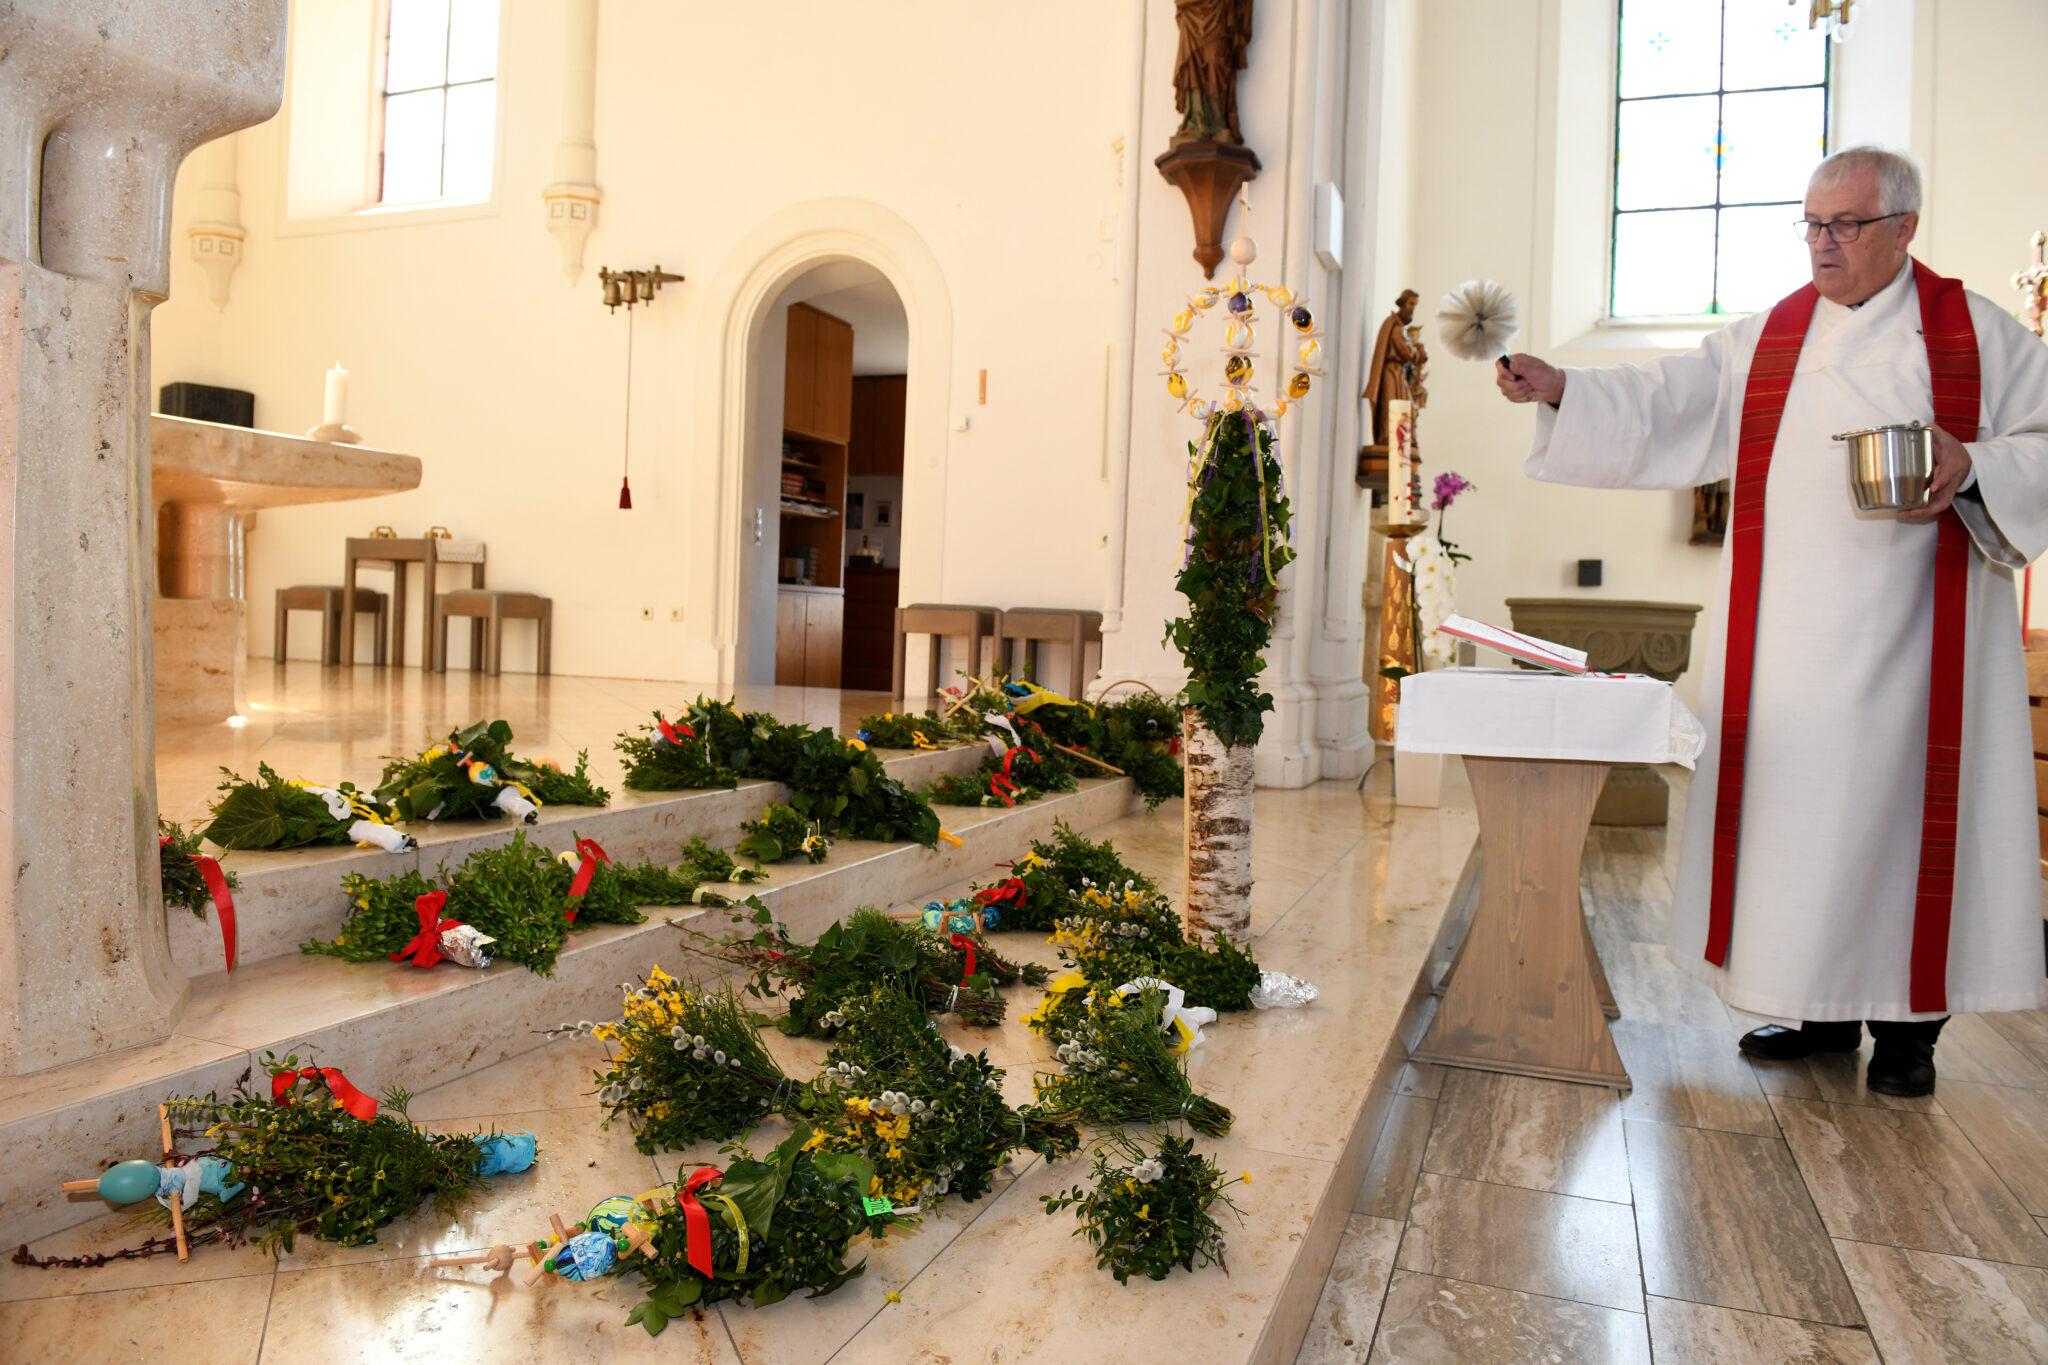 Dekan Albrecht Zepf, Pfarrer in Dietingen, Irslingen, Böhringen und Gößlingen, segnet in der  Irslinger St. Martins-Kirche Palmzweige. Foto: al